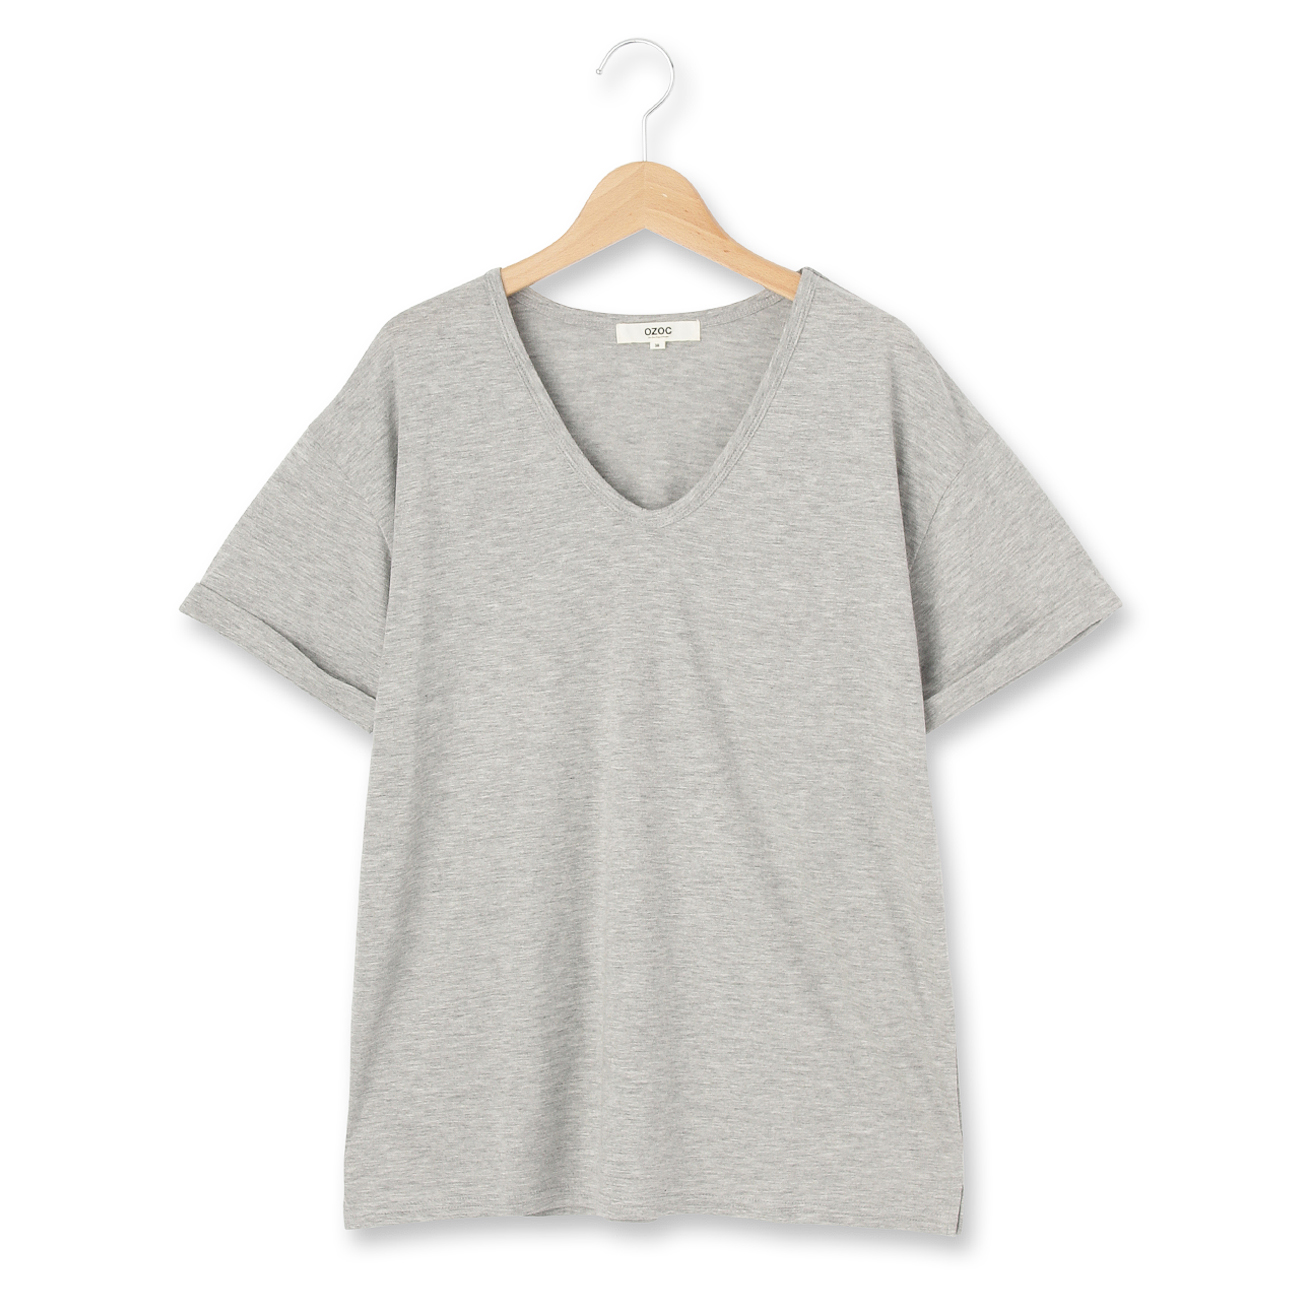 【OZOC (オゾック)】Vネックベーシックプルオーバーレディース トップス|カットソー・Tシャツ グレー